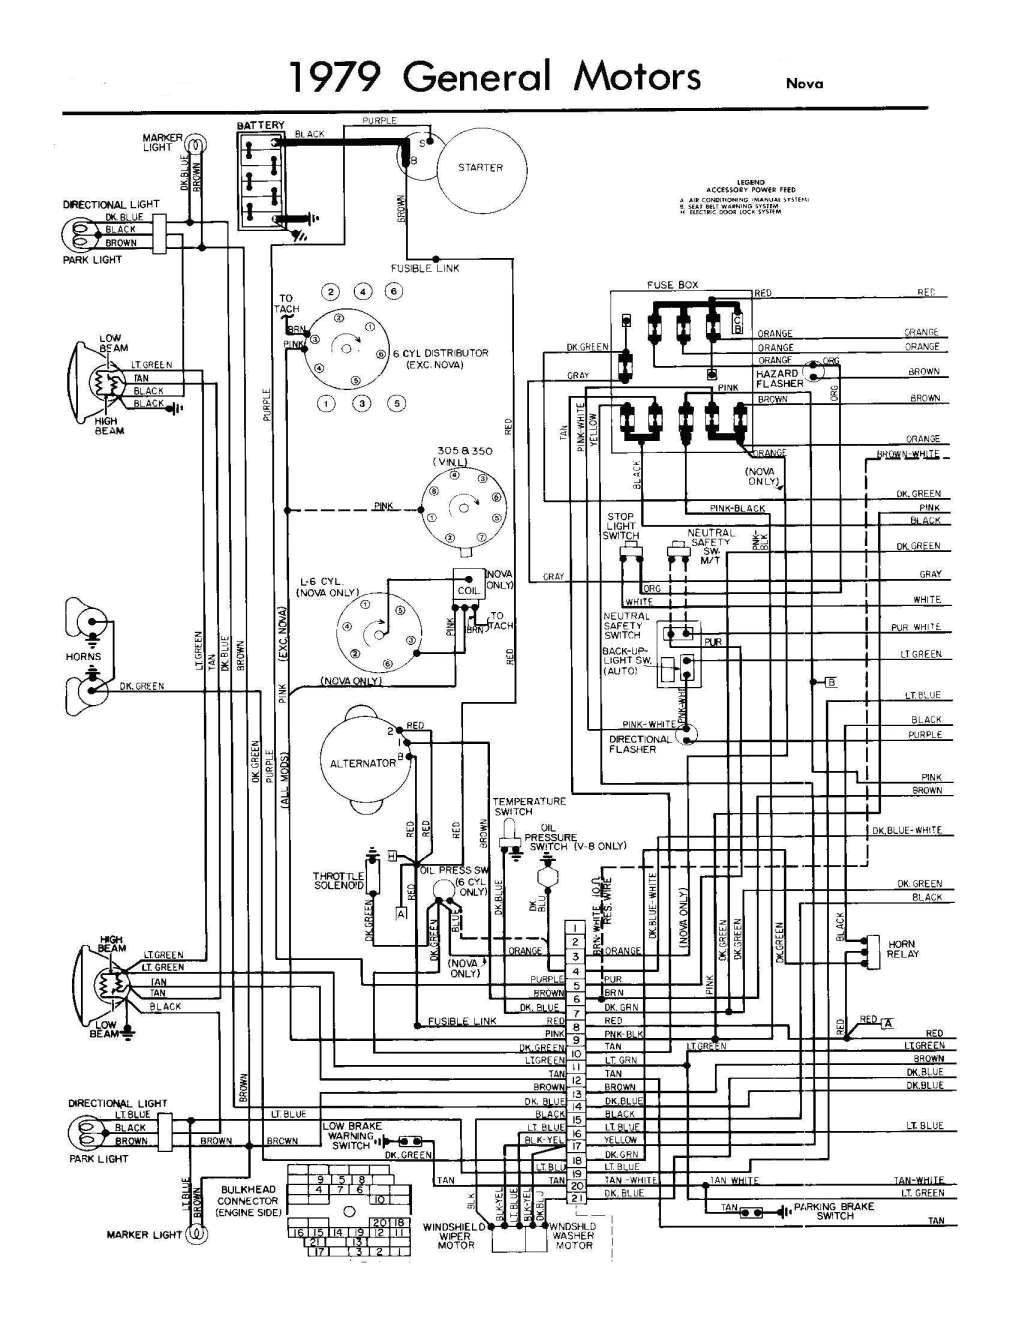 1974 Chevy C10 Wiring Diagram Gmc Truck Wiring Wiring Diagram Data